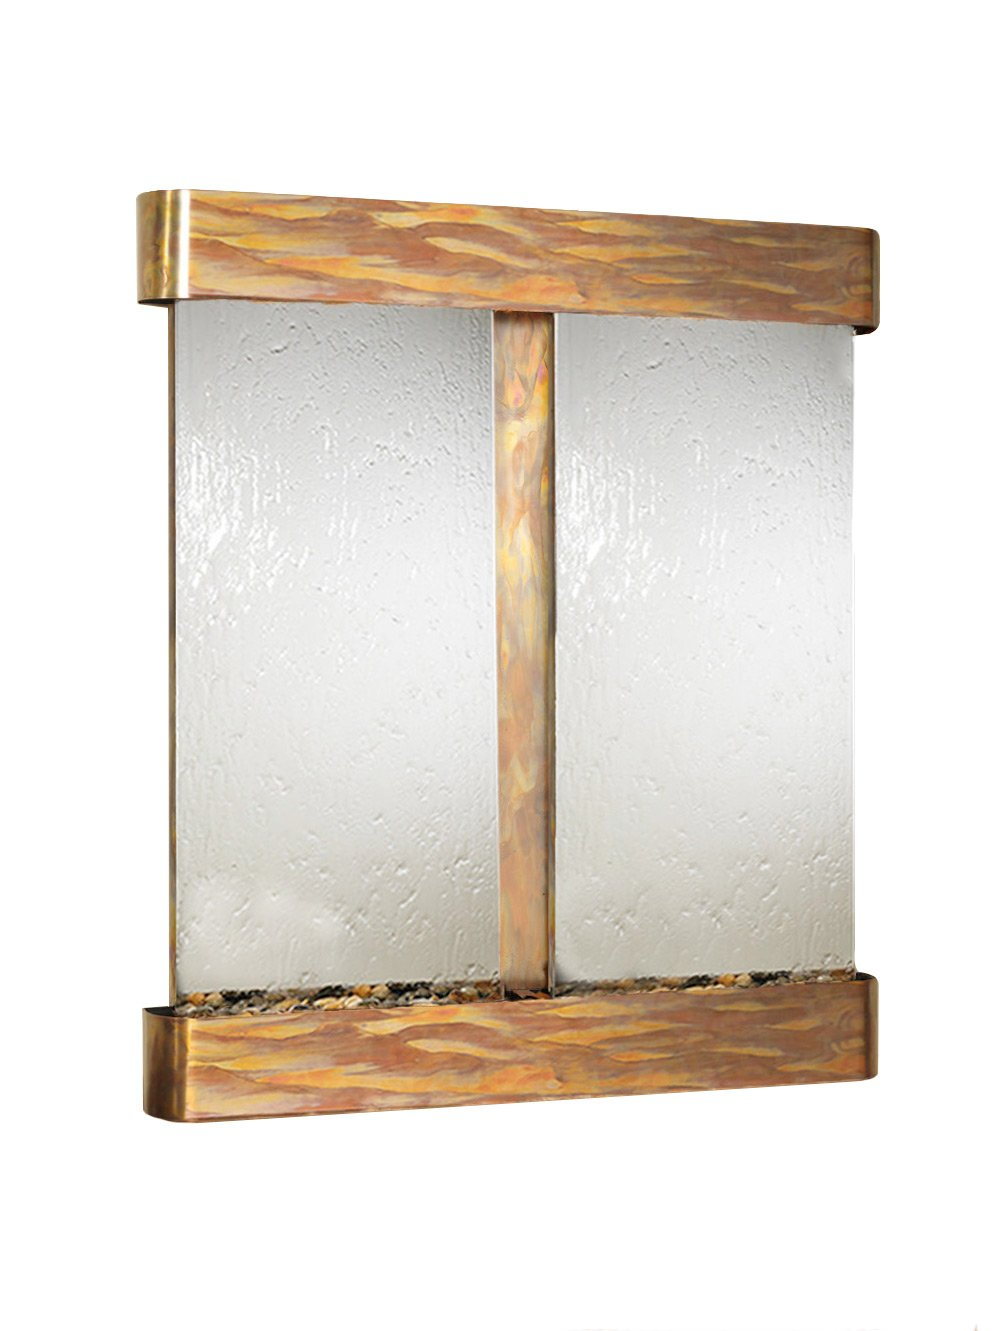 Adagio Cottonwood Falls Wall Fountain Silver Mirror Rustic Copper - CFR1040